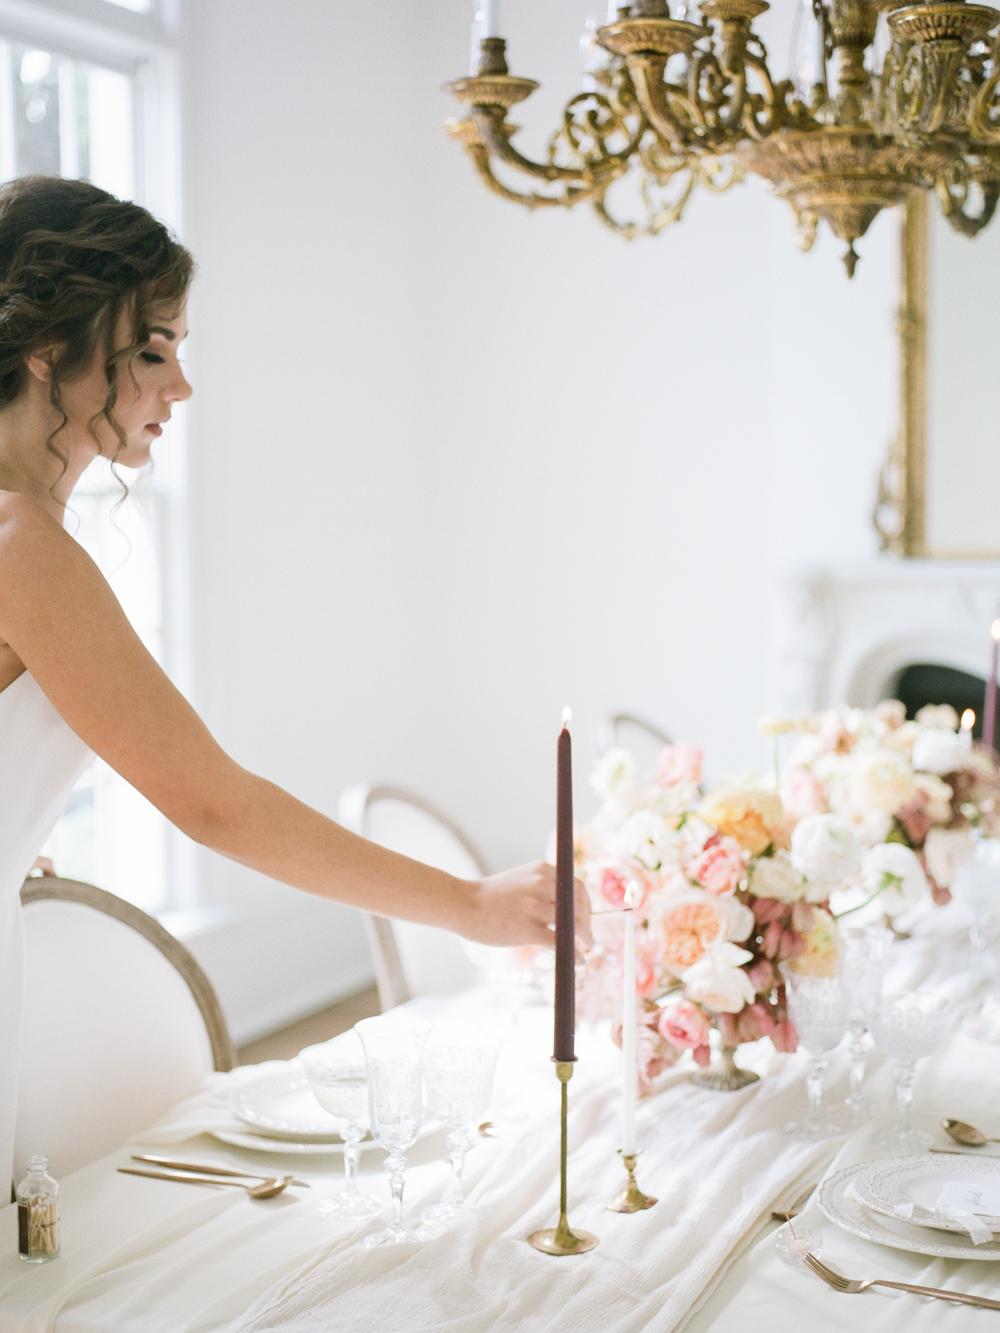 Christine Gosch - destination film photographer - houston wedding photographer - fine art film photographer - elopement photographer - destination wedding - understated wedding - simple beautiful wedding photography-97.jpg